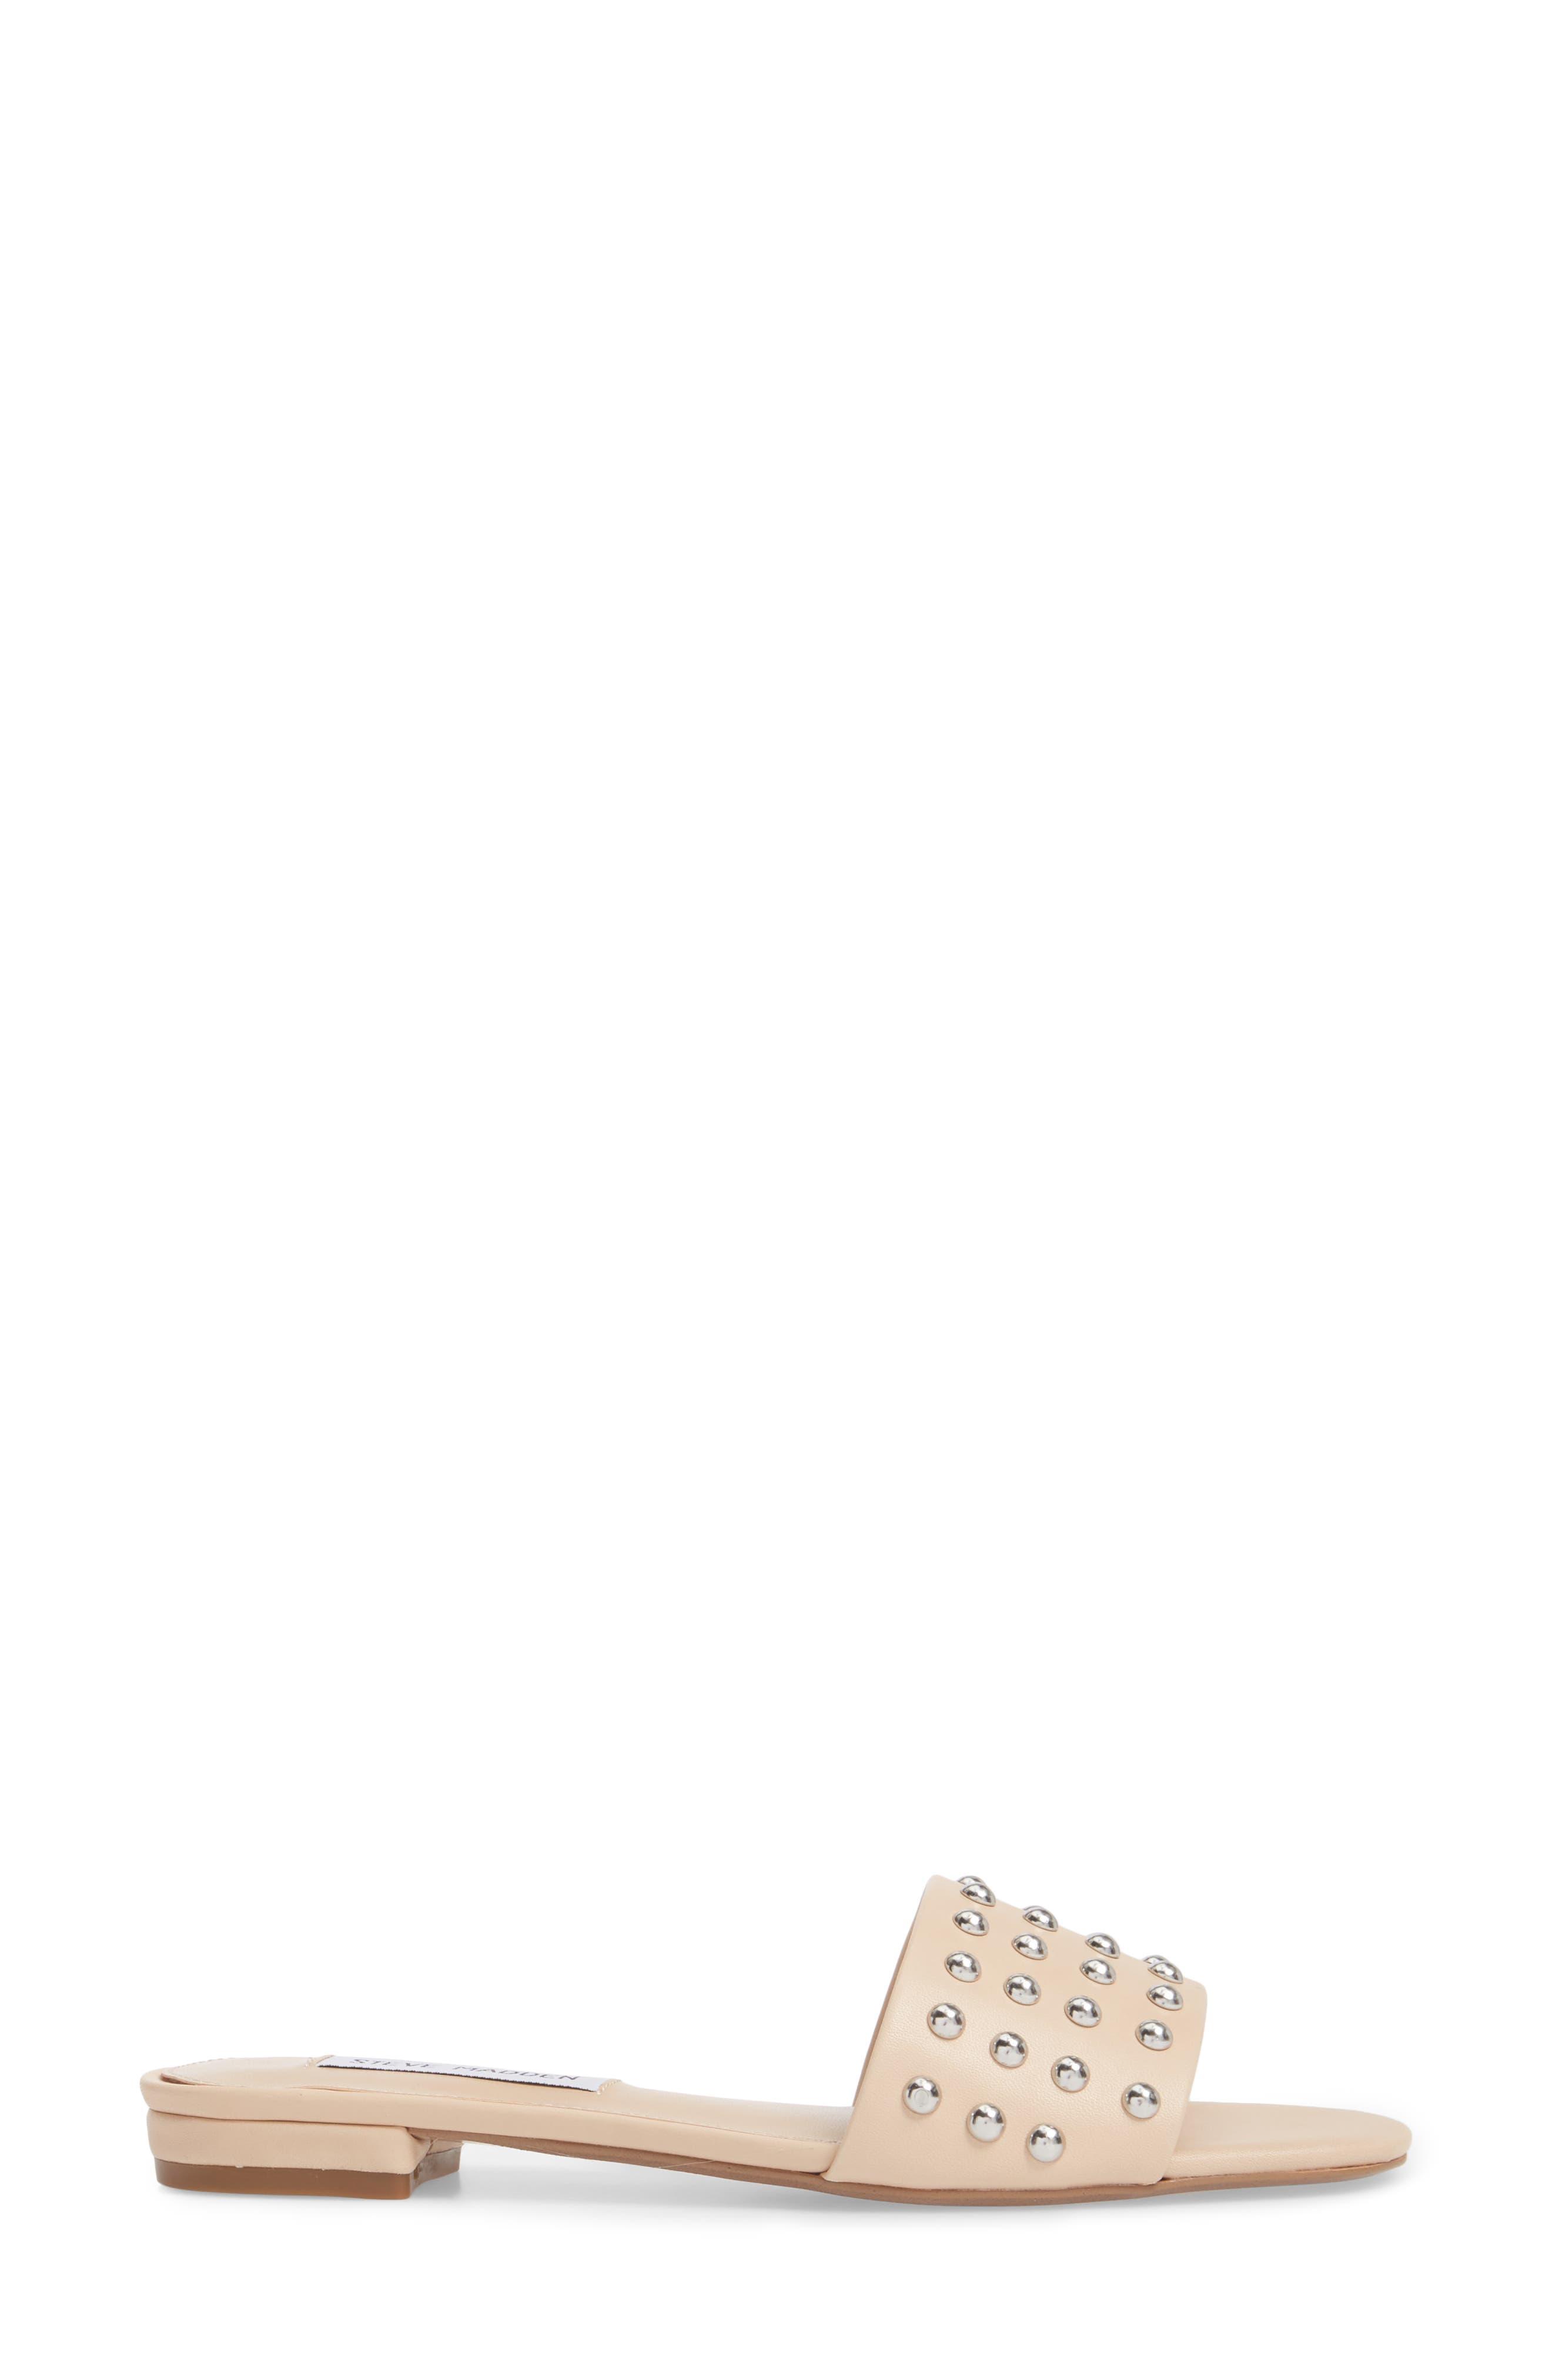 Viv Studded Slide Sandal,                             Alternate thumbnail 3, color,                             Blush Leather